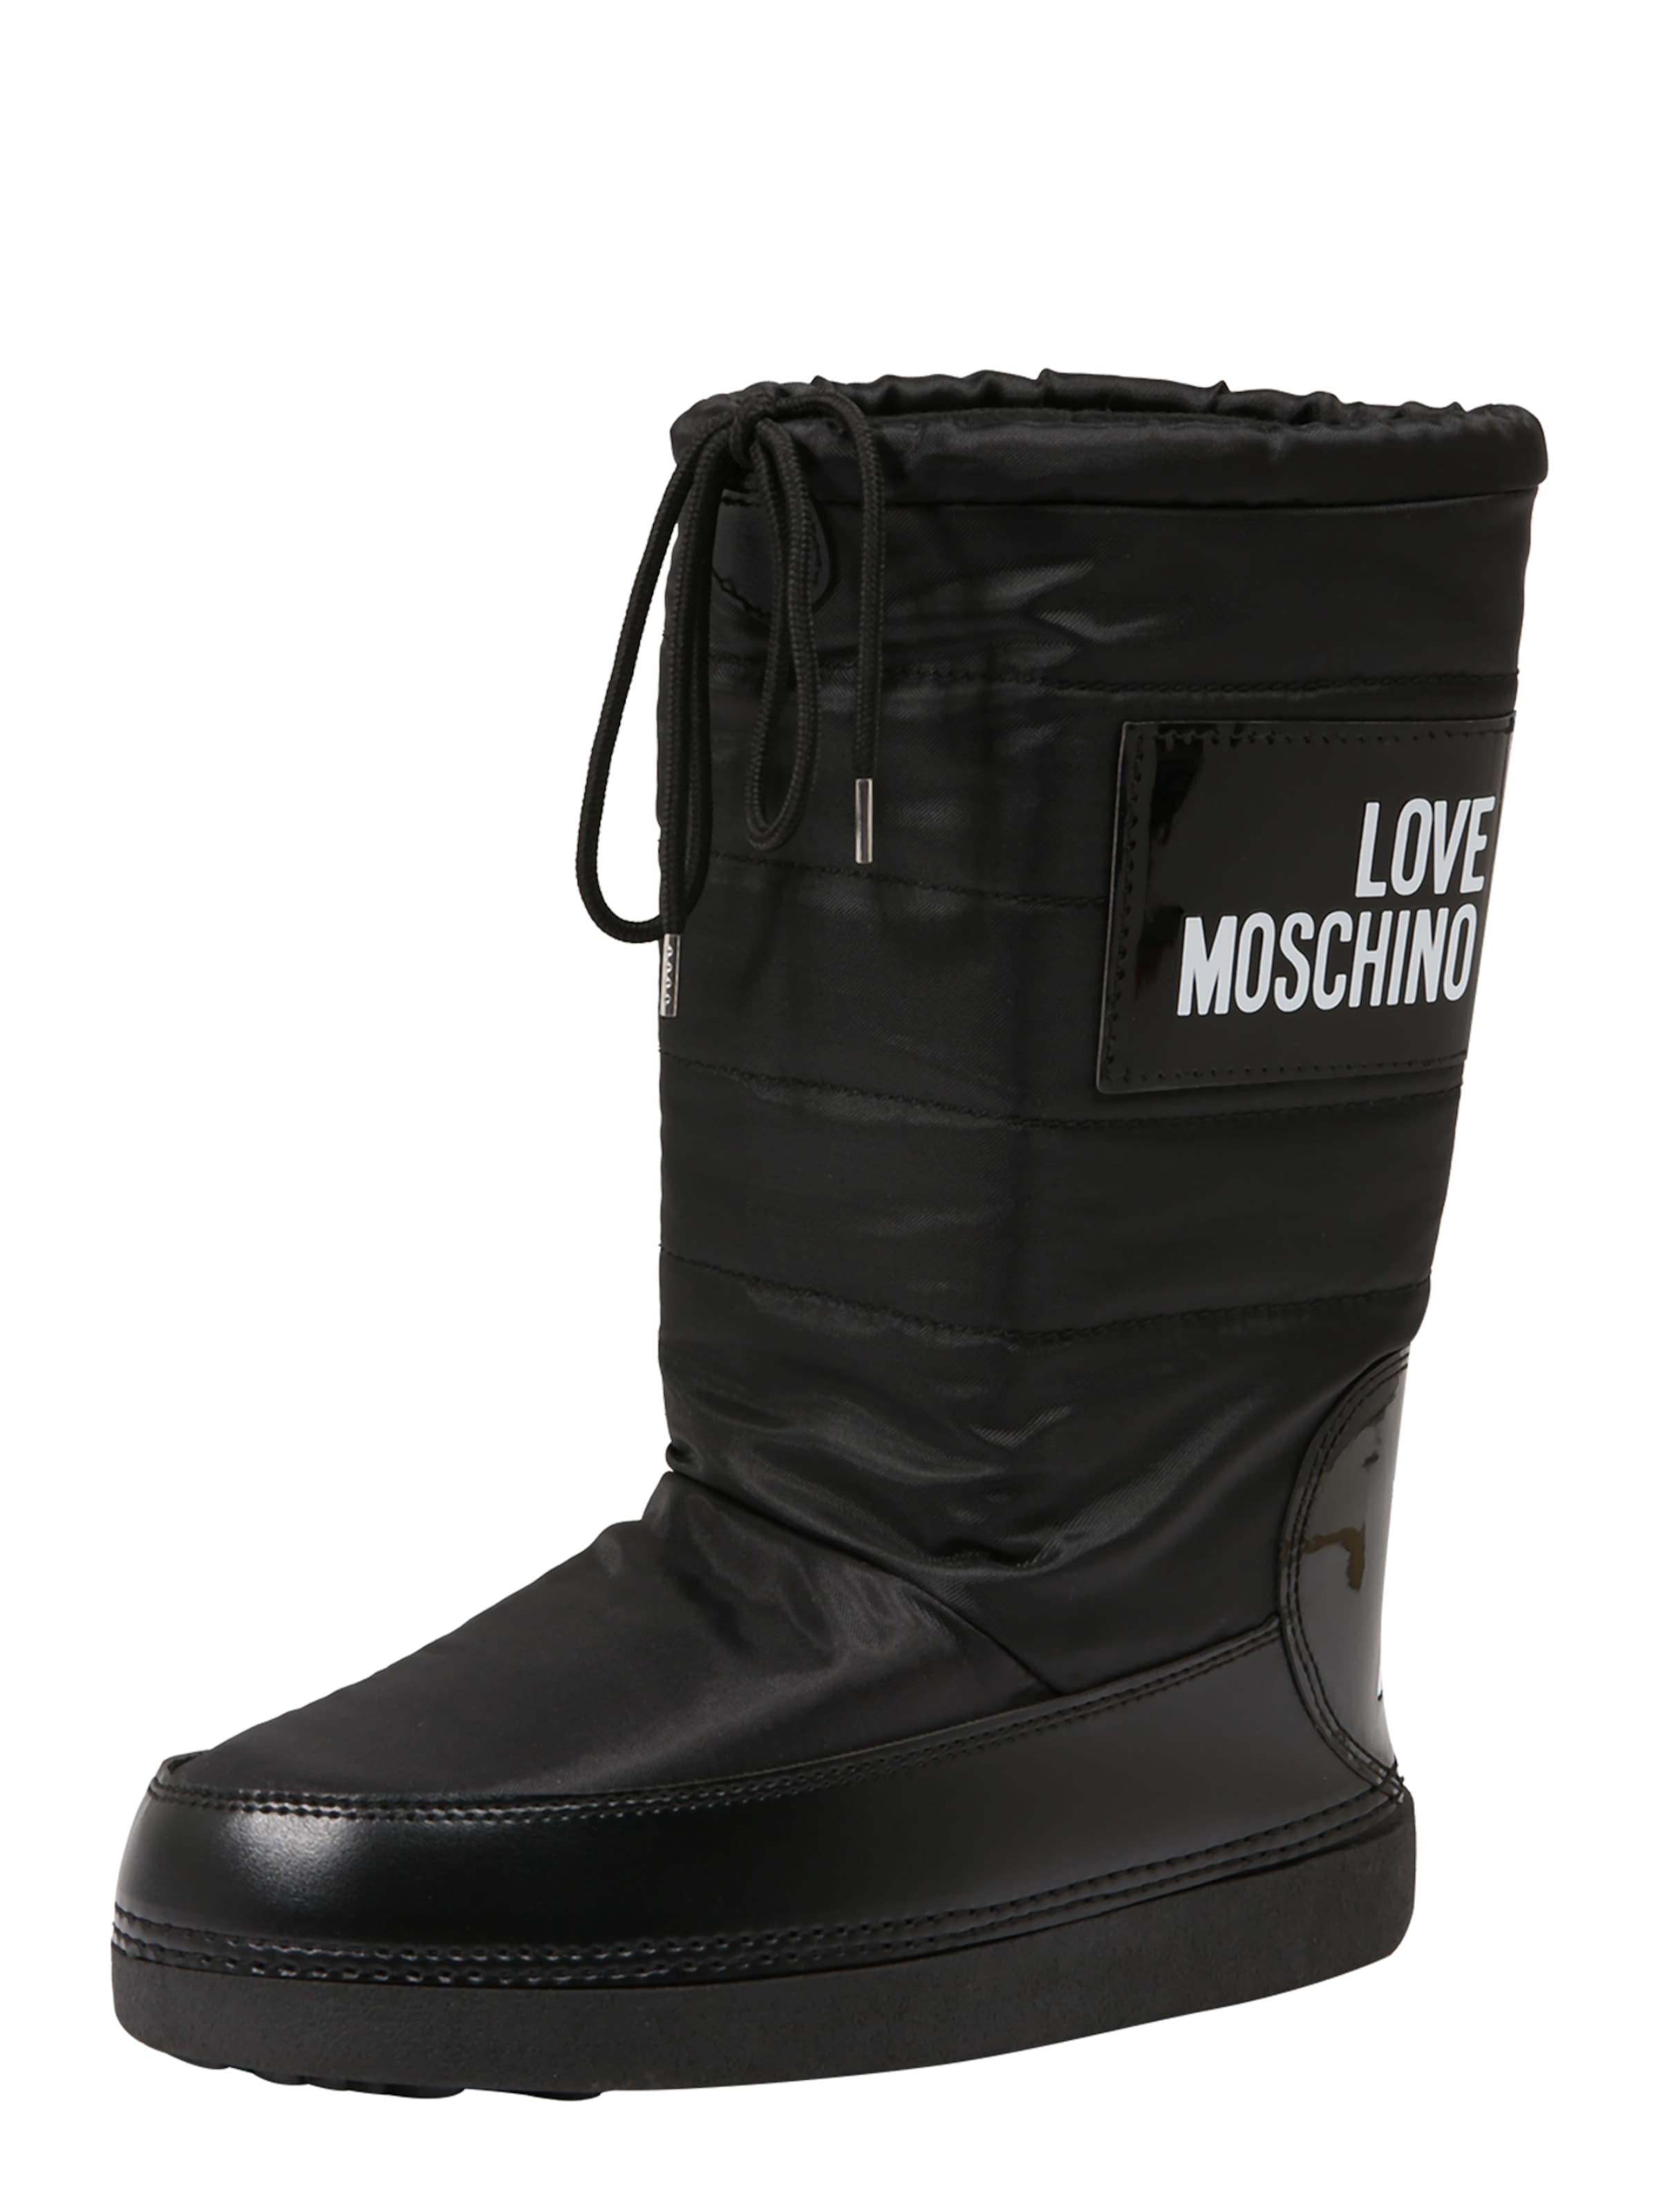 Boot' Stiefel Schwarz Moschino 'ski Love In PkNnw80OX